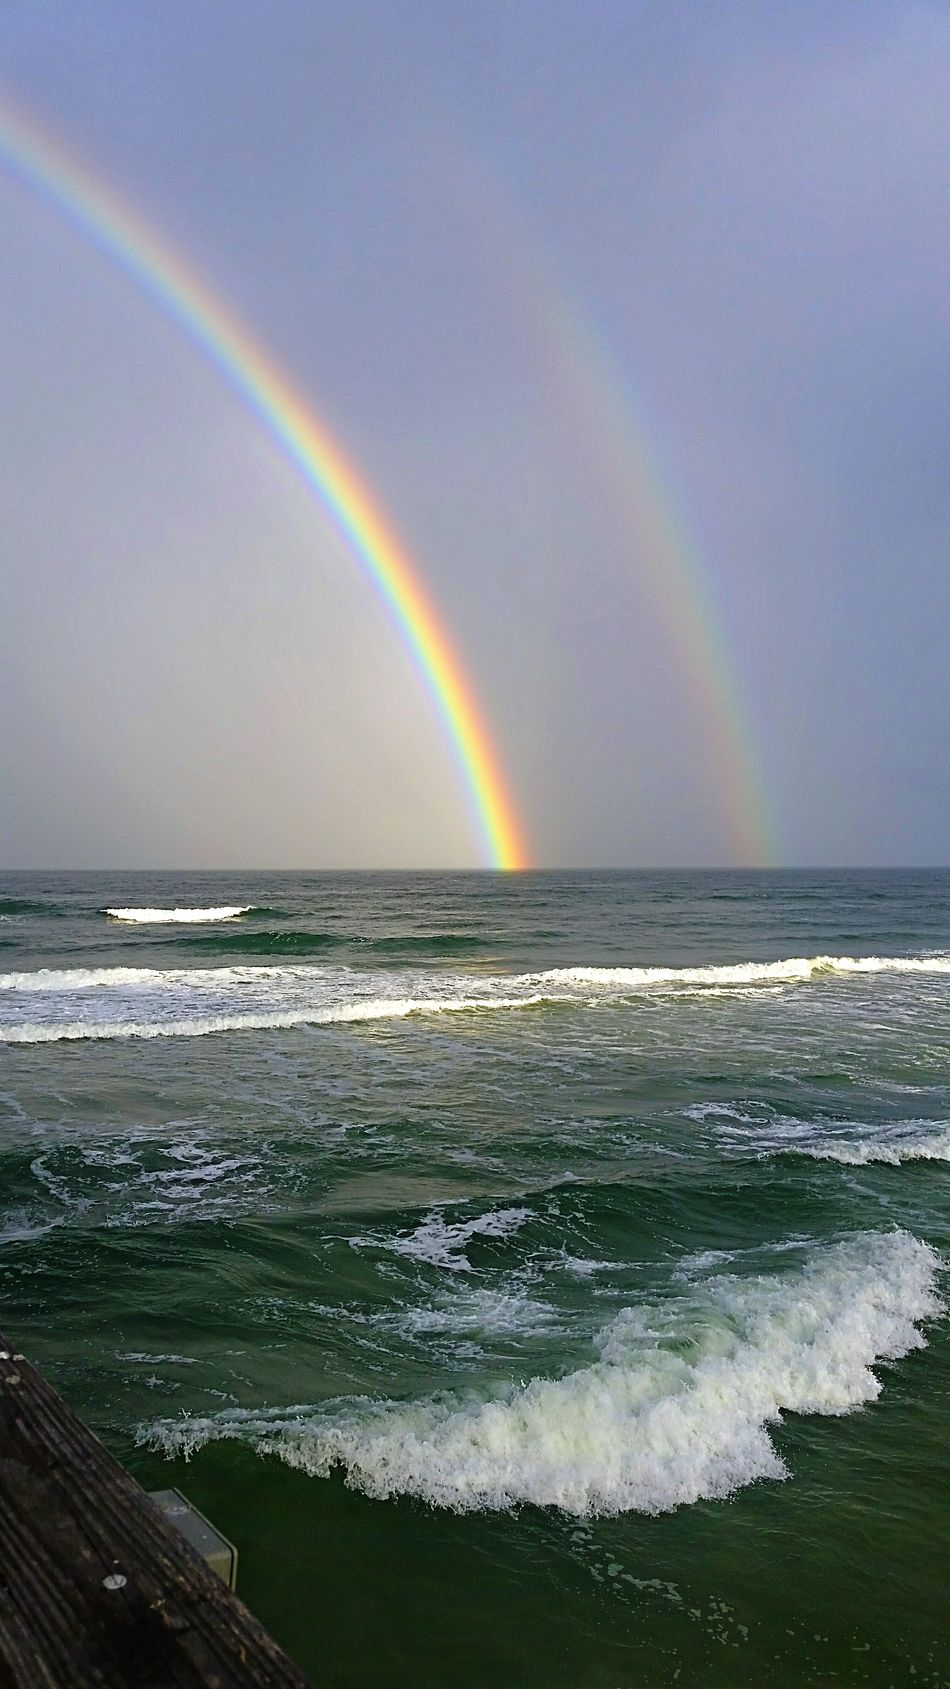 Doublerainbow Amazing Breathtaking Rainbow🌈 Beautiful ♥ Bright Colors WOW Ilovefl